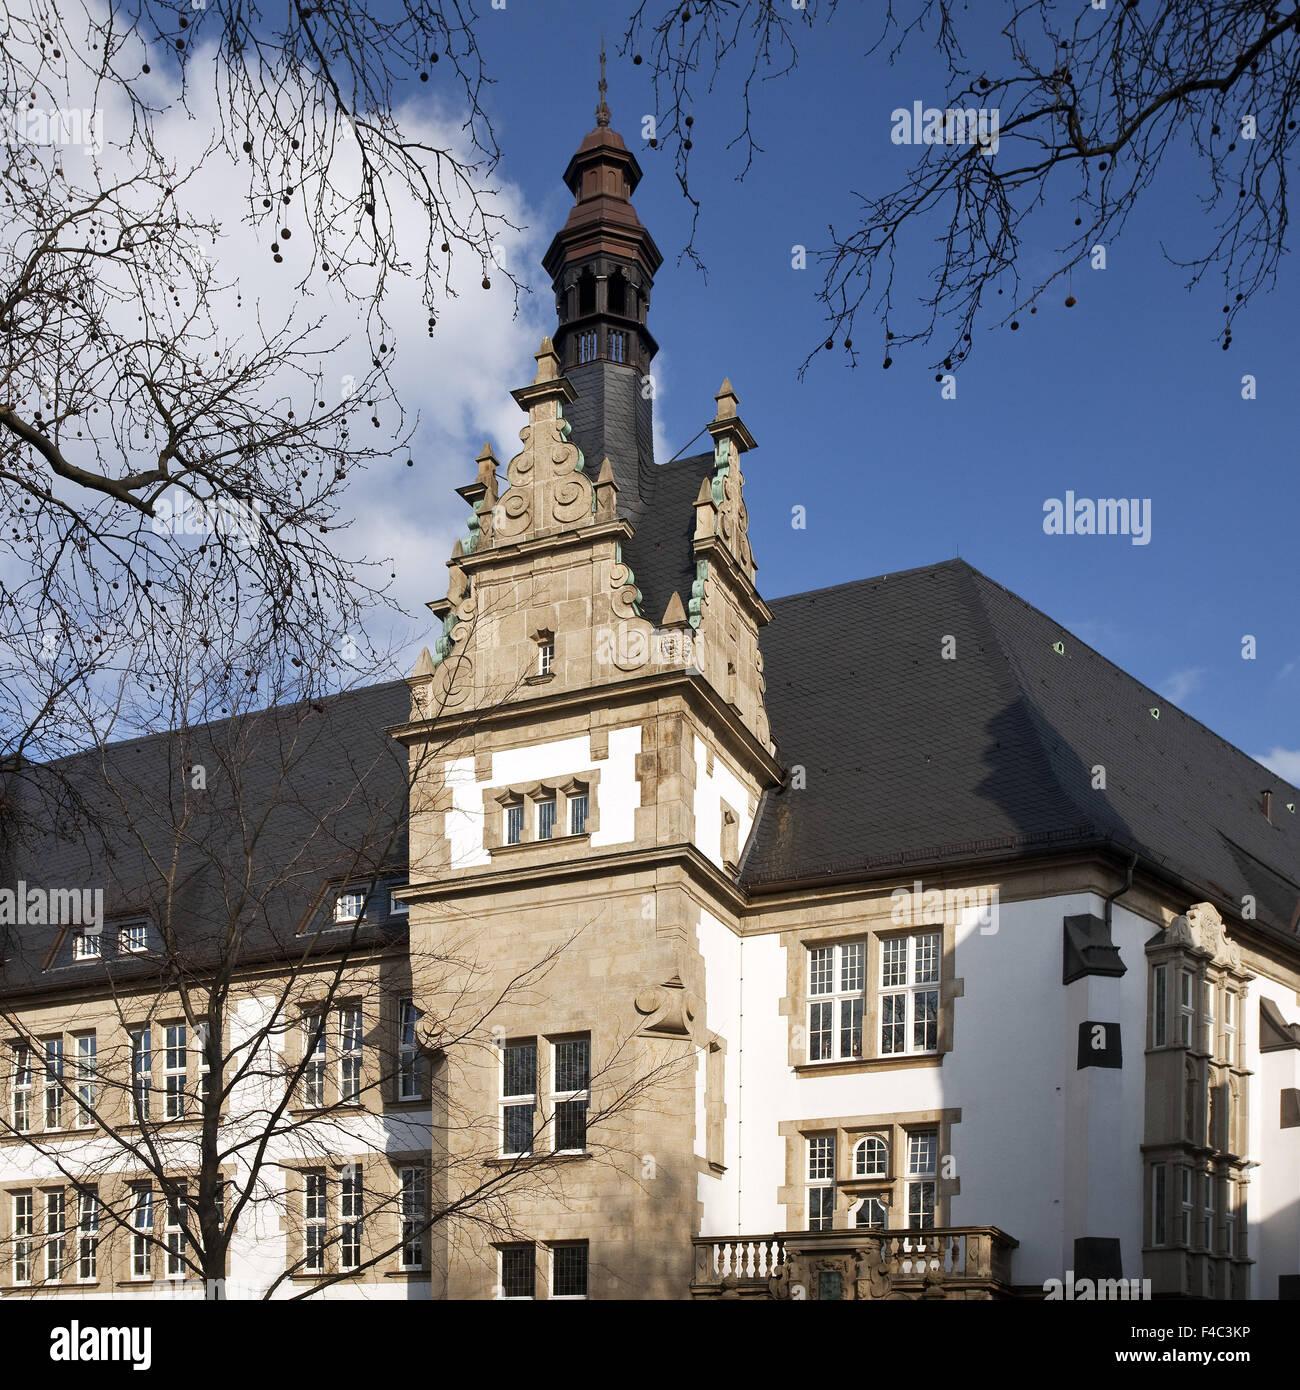 School Petrinum, Recklinghausen, Germany Stock Photo